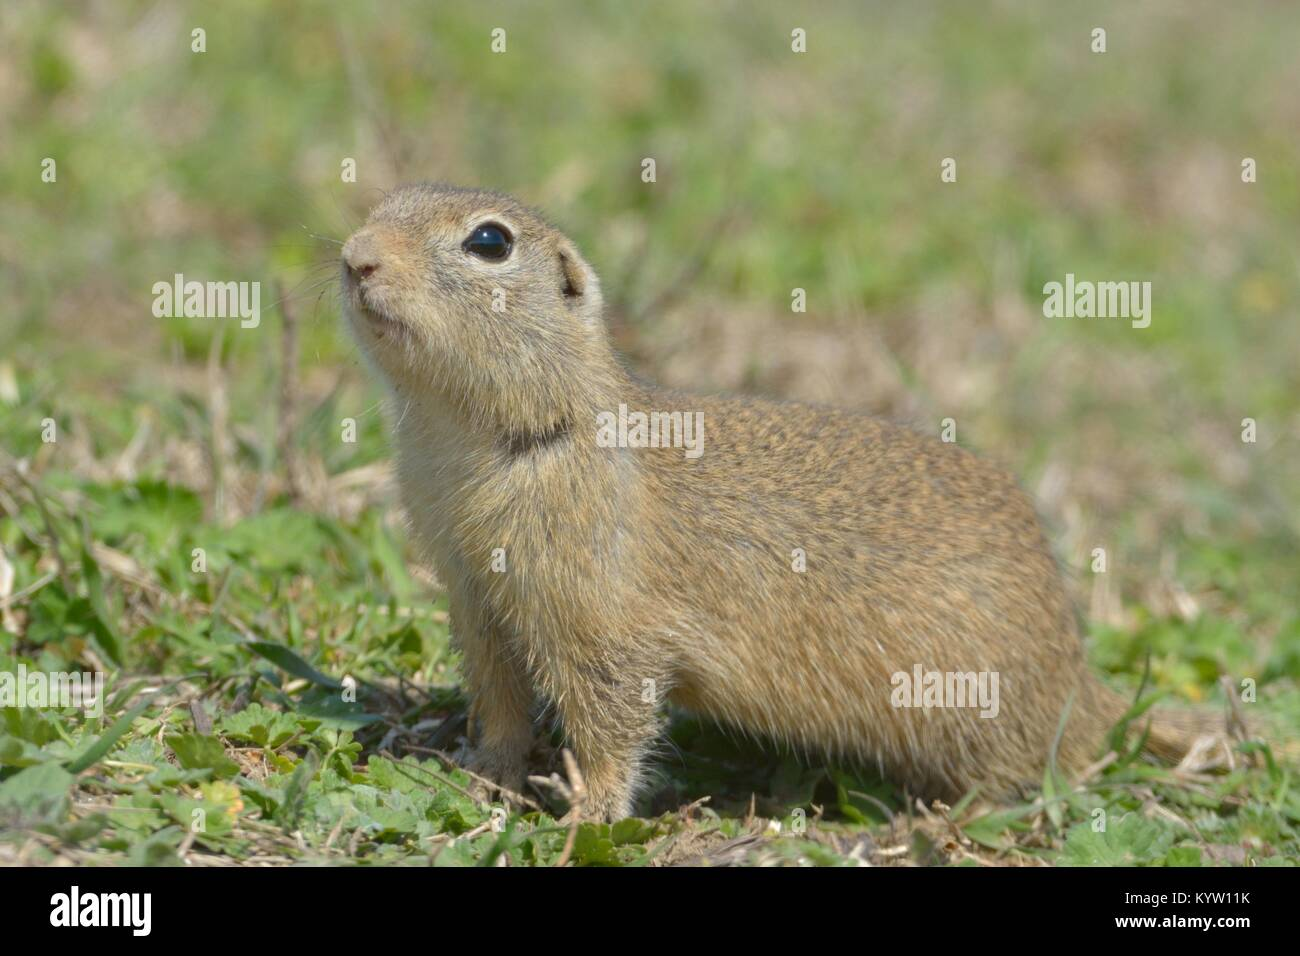 European Ground Squirrel or Souslik (Spermophilus  citellus) in Springtime, searching for Enemies - Stock Image